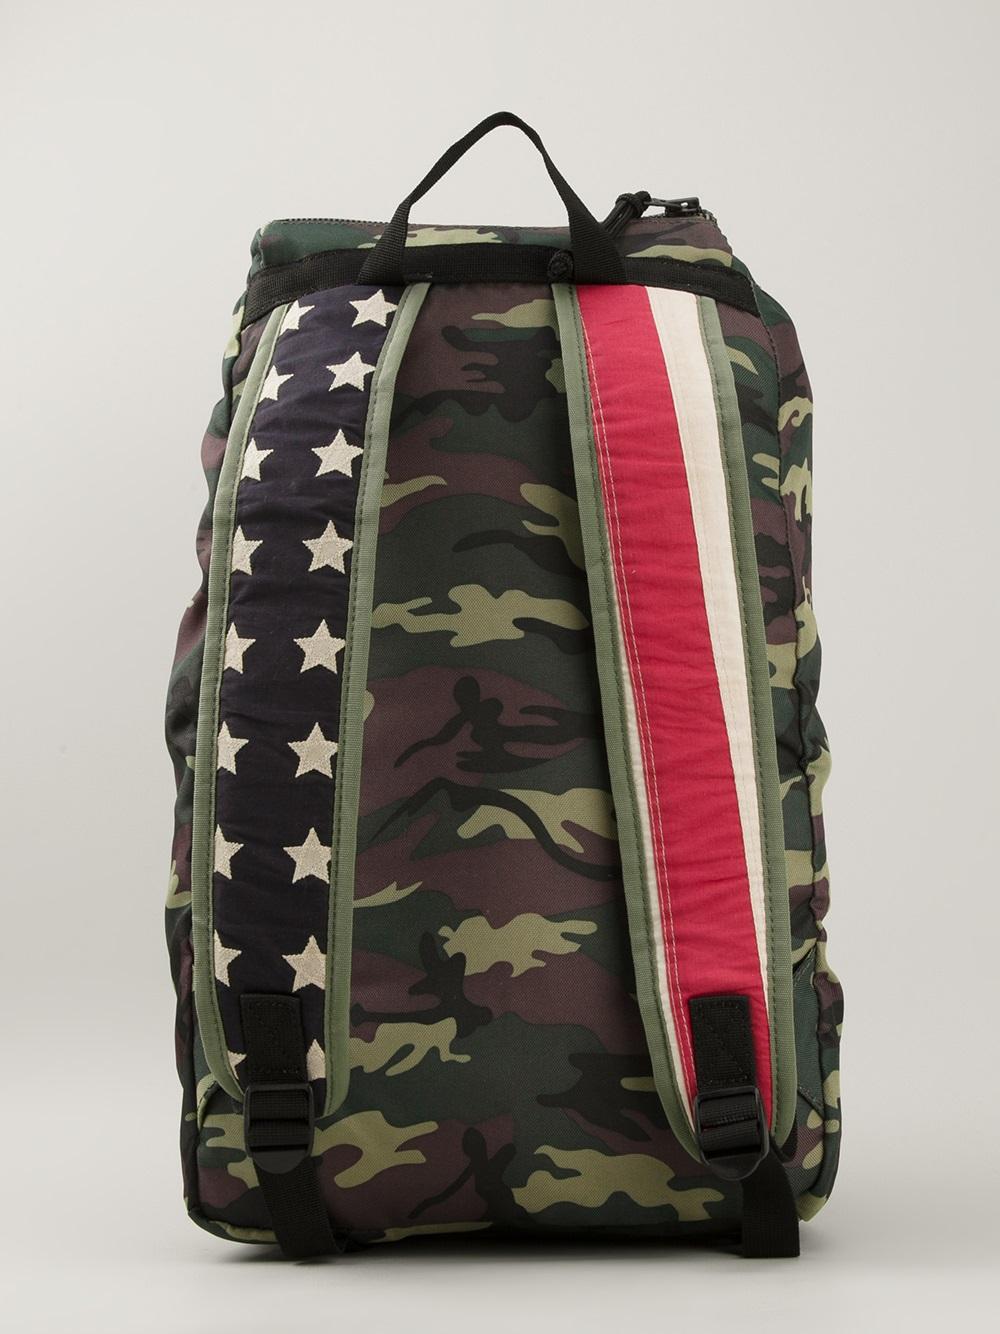 Lyst - Ralph Lauren Camouflage Backpack in Green for Men 3cbb32e64b00f